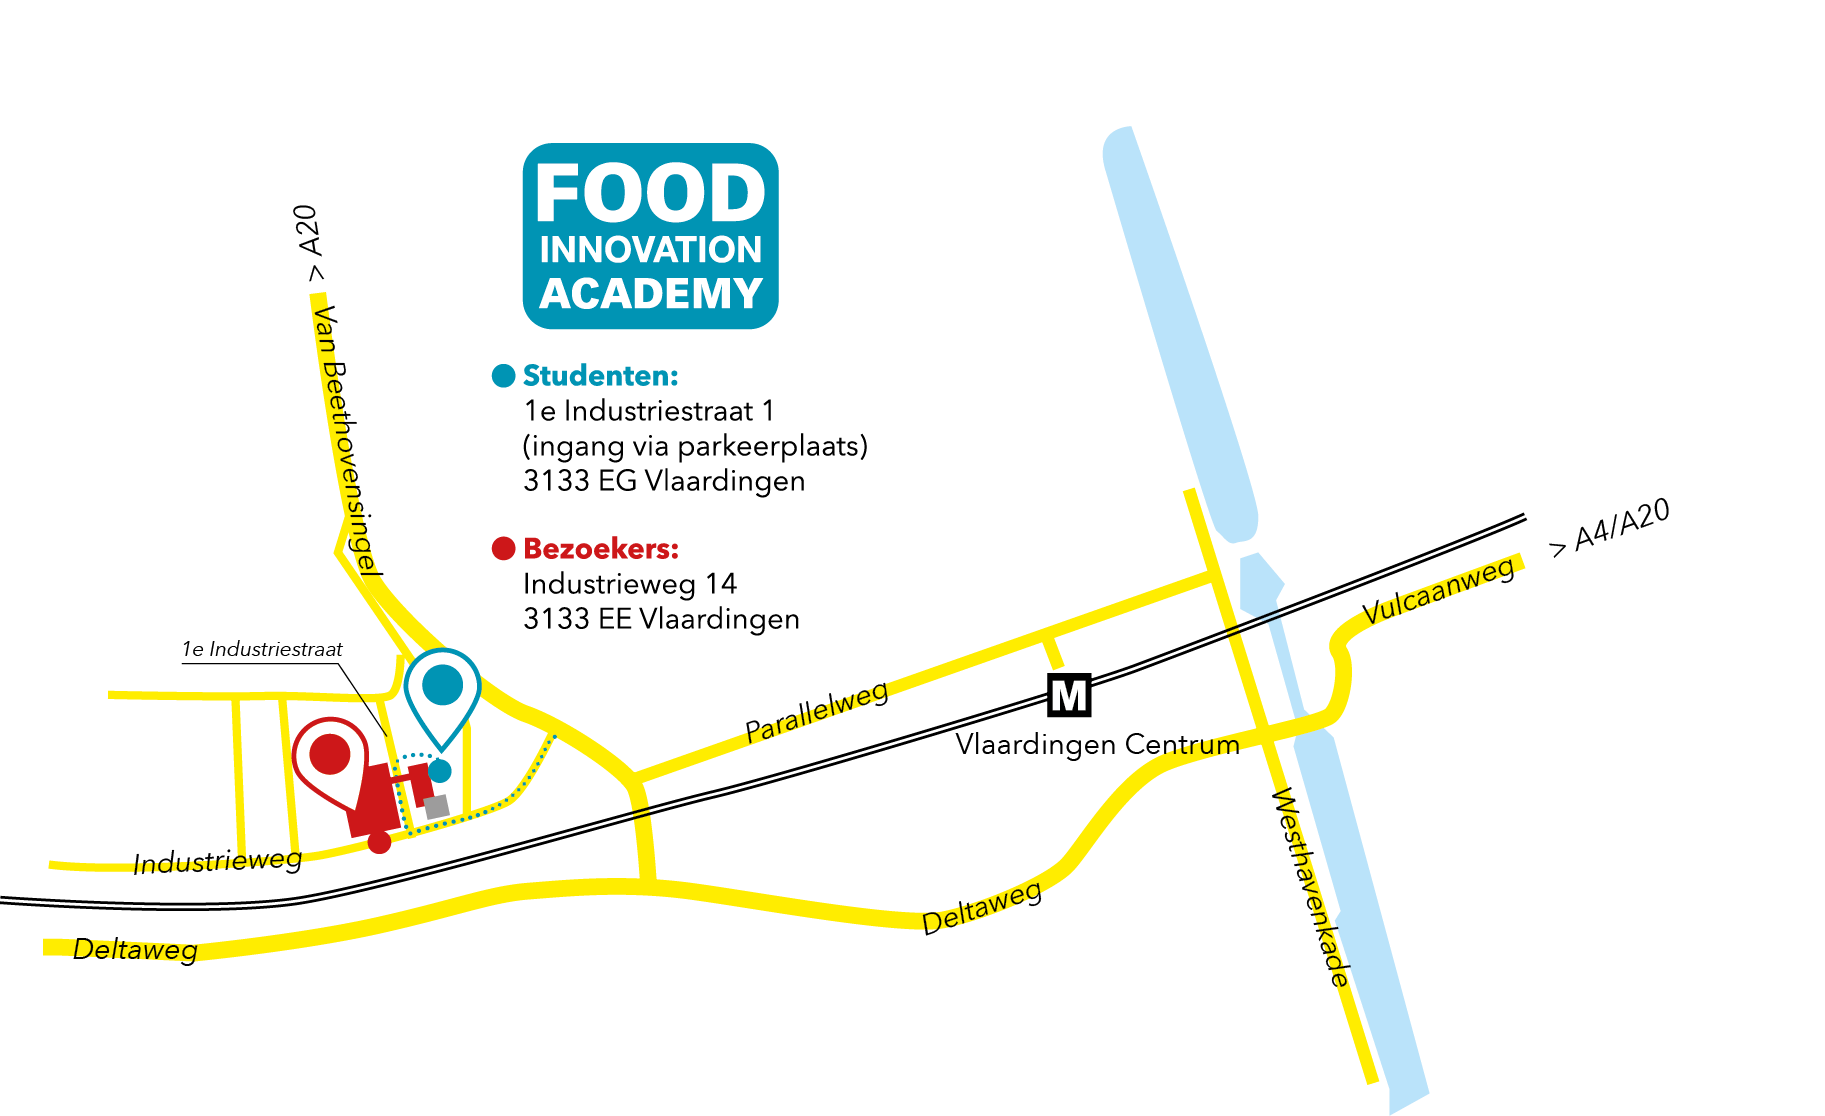 Routekaartje naar Food Innovation Academy